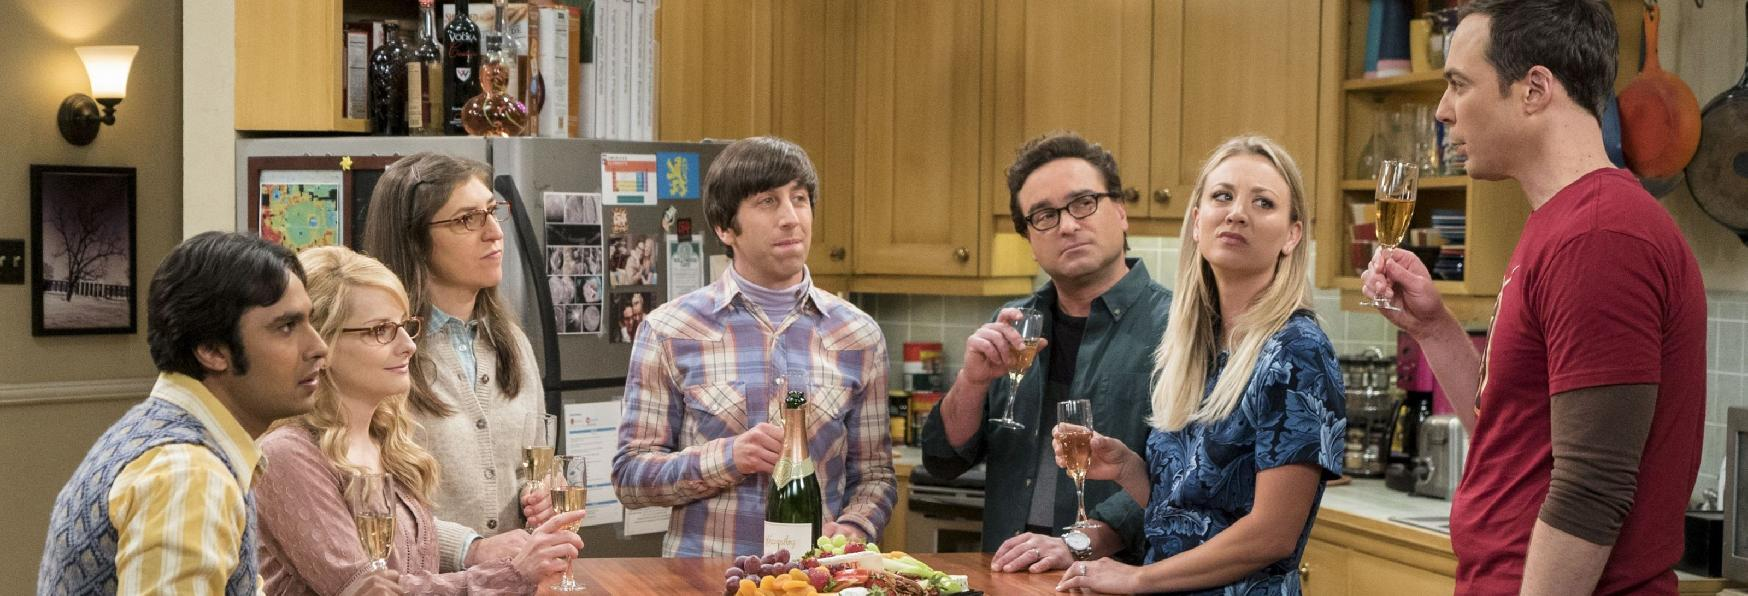 The Big Bang Theory 12x10: La Recensione